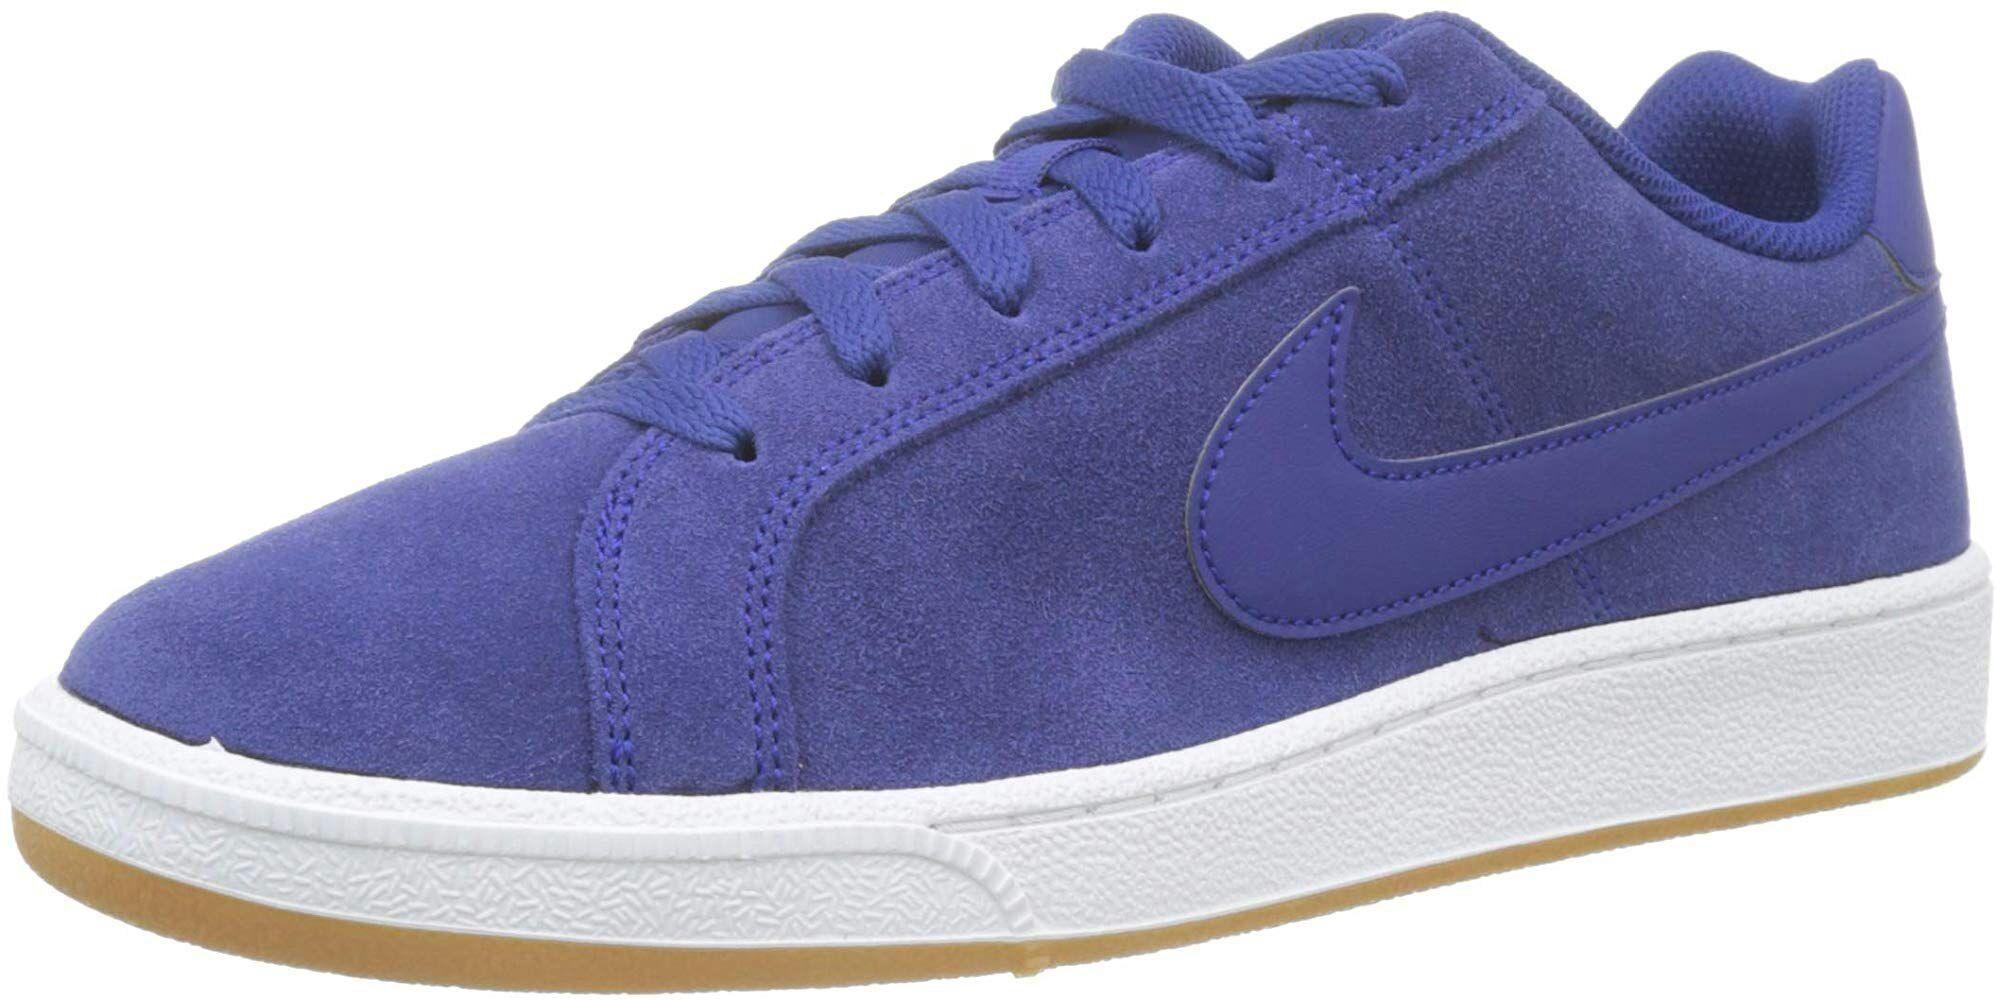 Chaussures de sport Nike Court Royale Suede - Bleues (Taille 42.5)